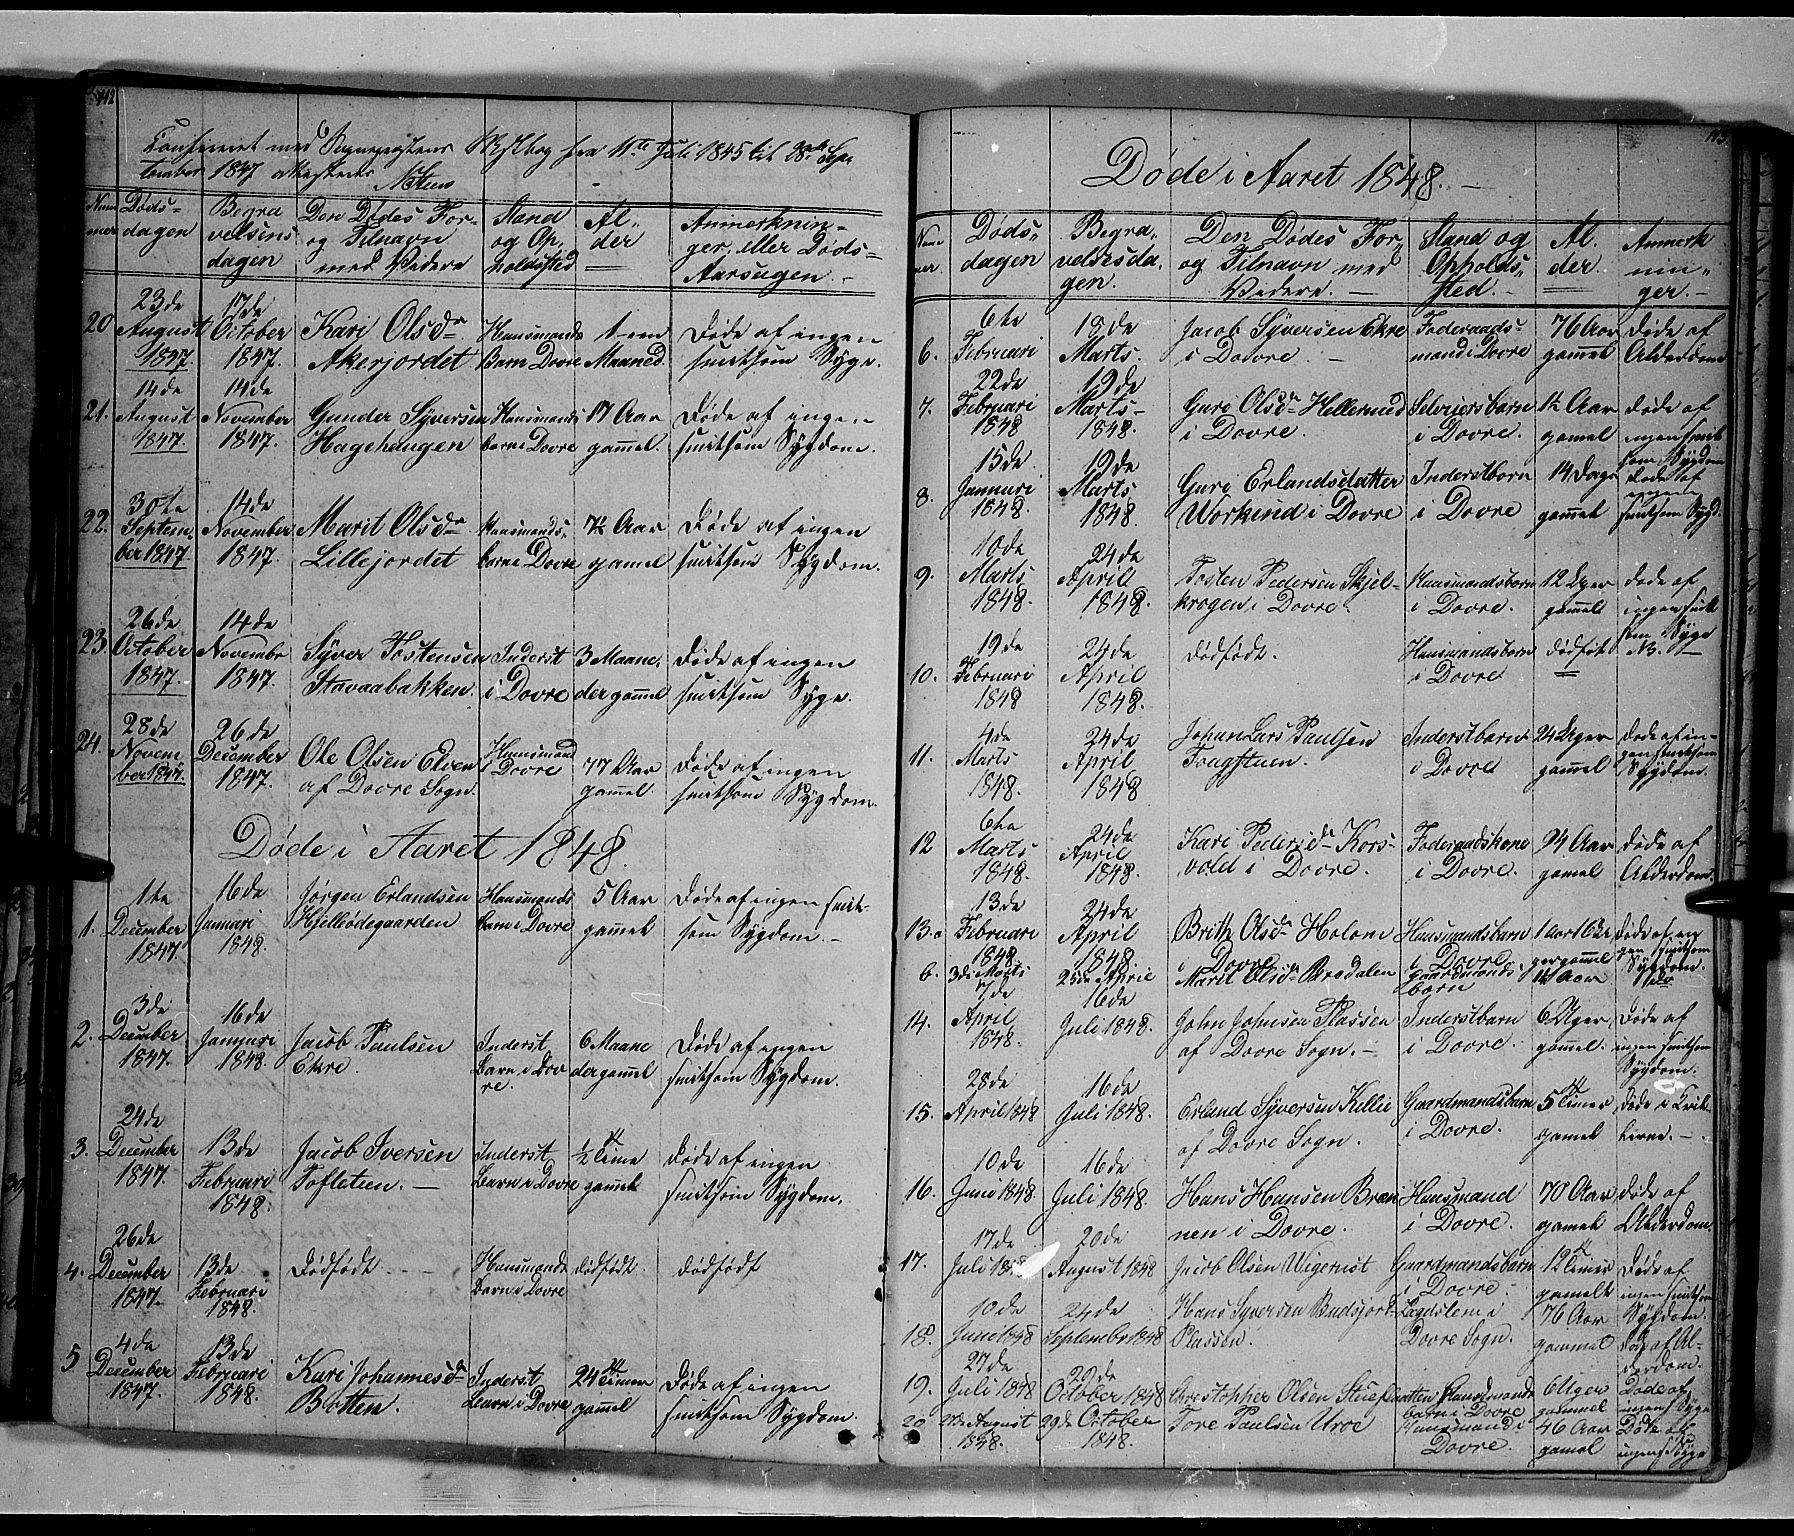 SAH, Lesja prestekontor, Klokkerbok nr. 3, 1842-1862, s. 112-113